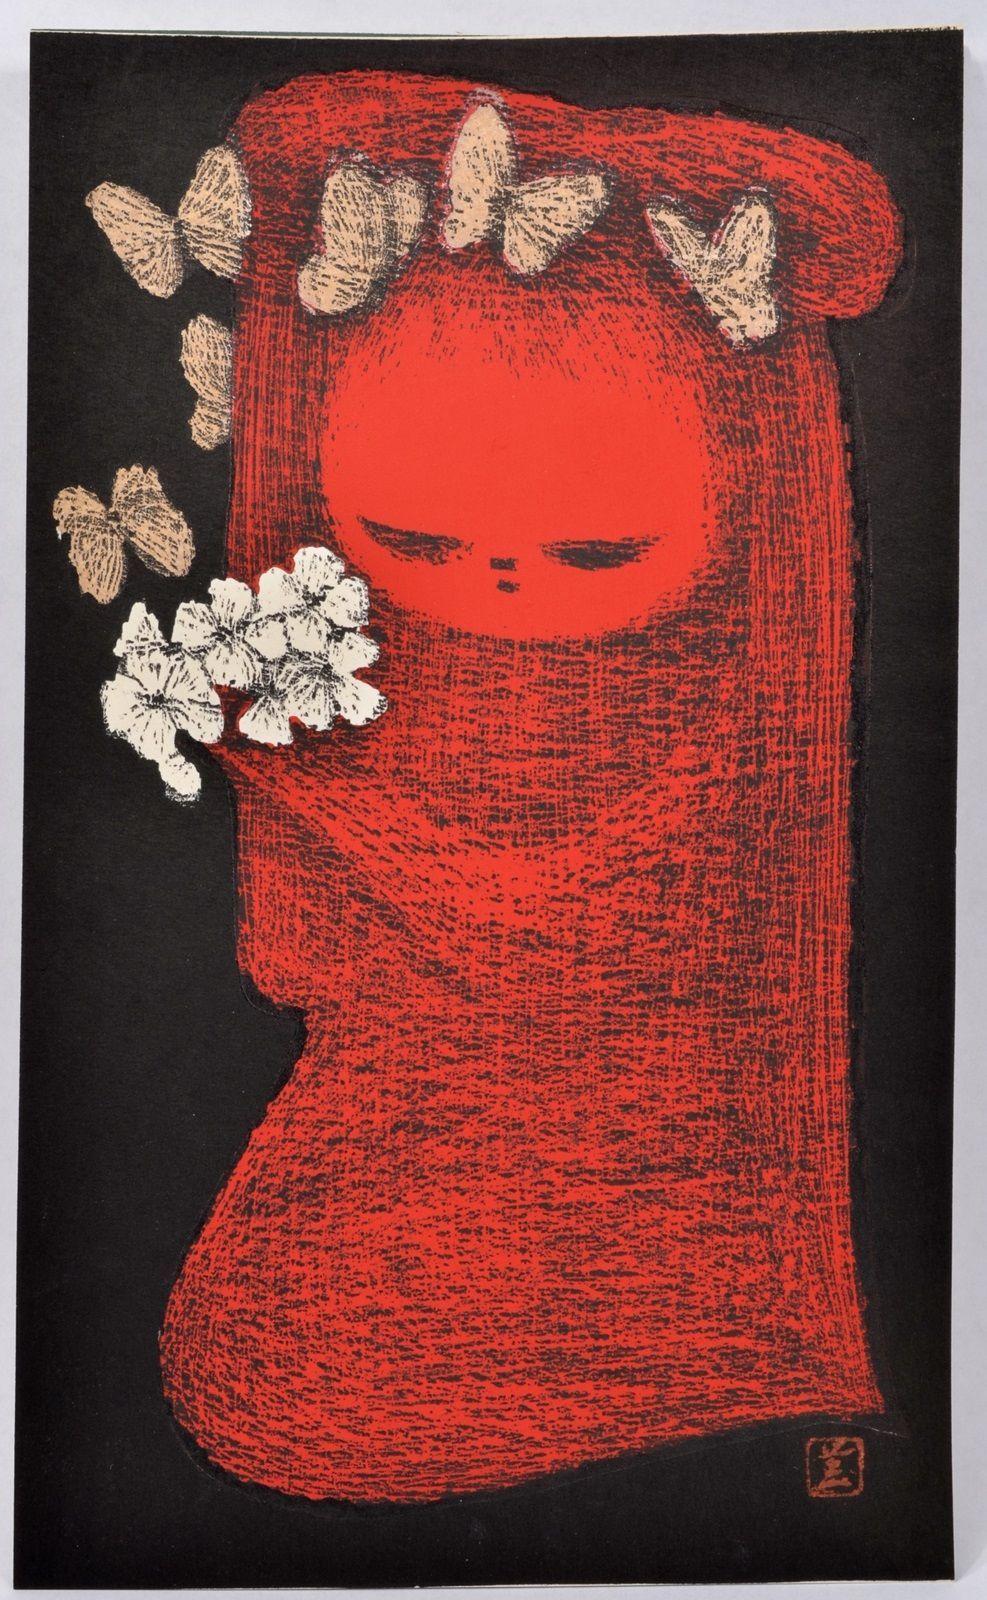 Mid Century 1950s Japanese Kaoru Kawano Woodblock Print